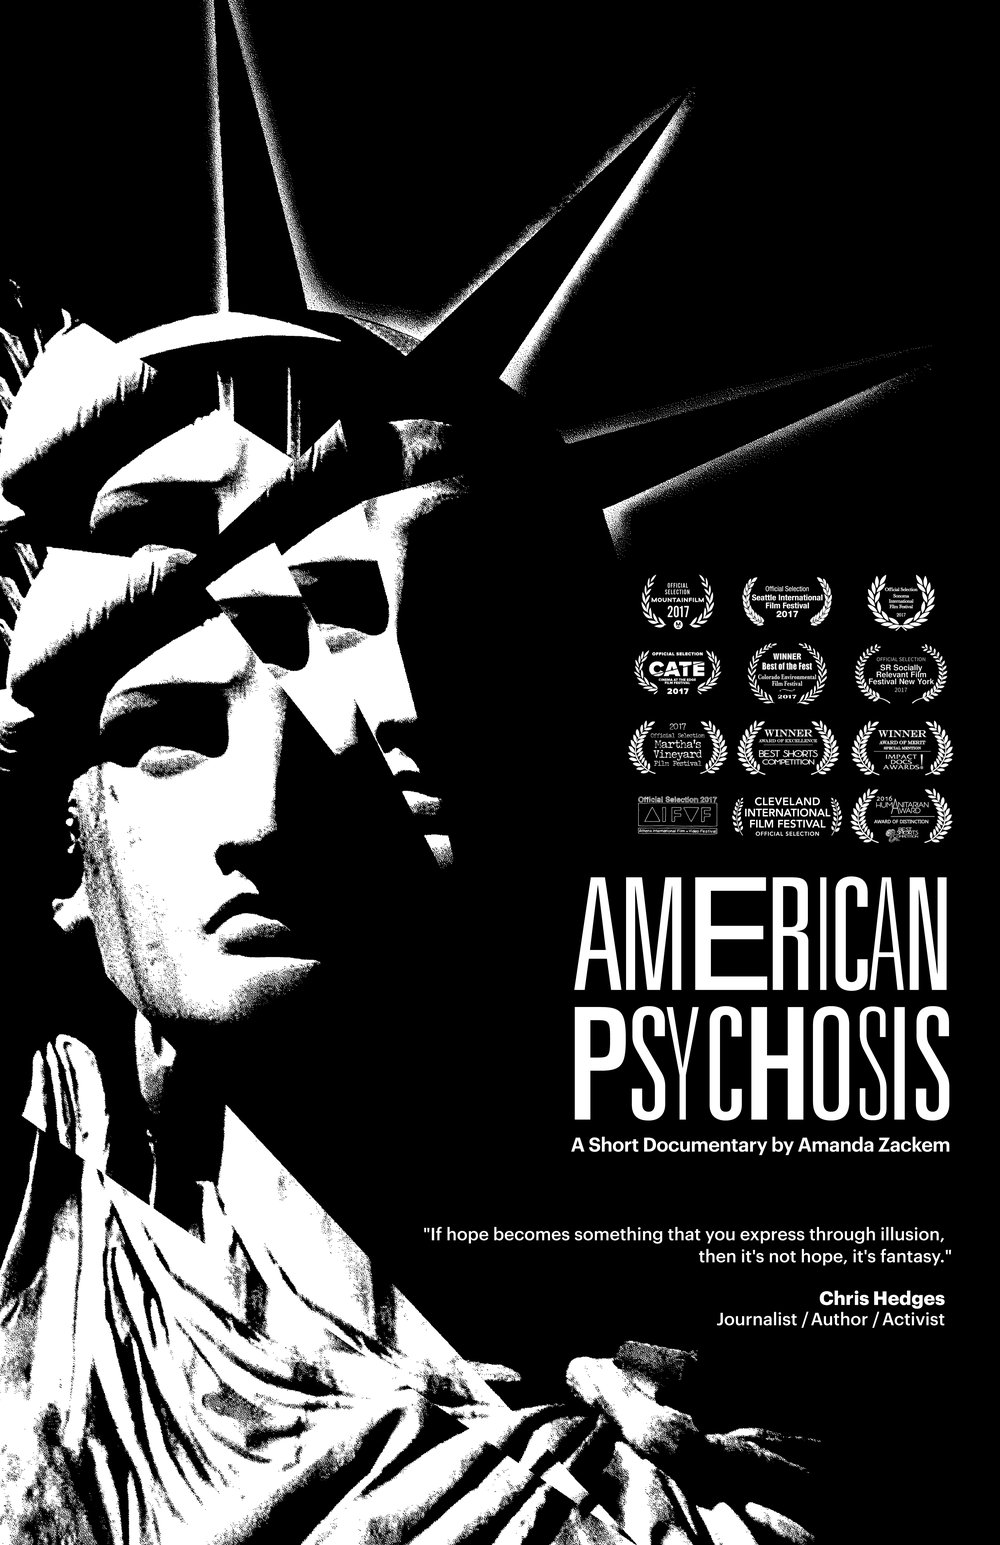 American Psychosis - Poster credit:  http://solidarityofunbridledlabour.com/